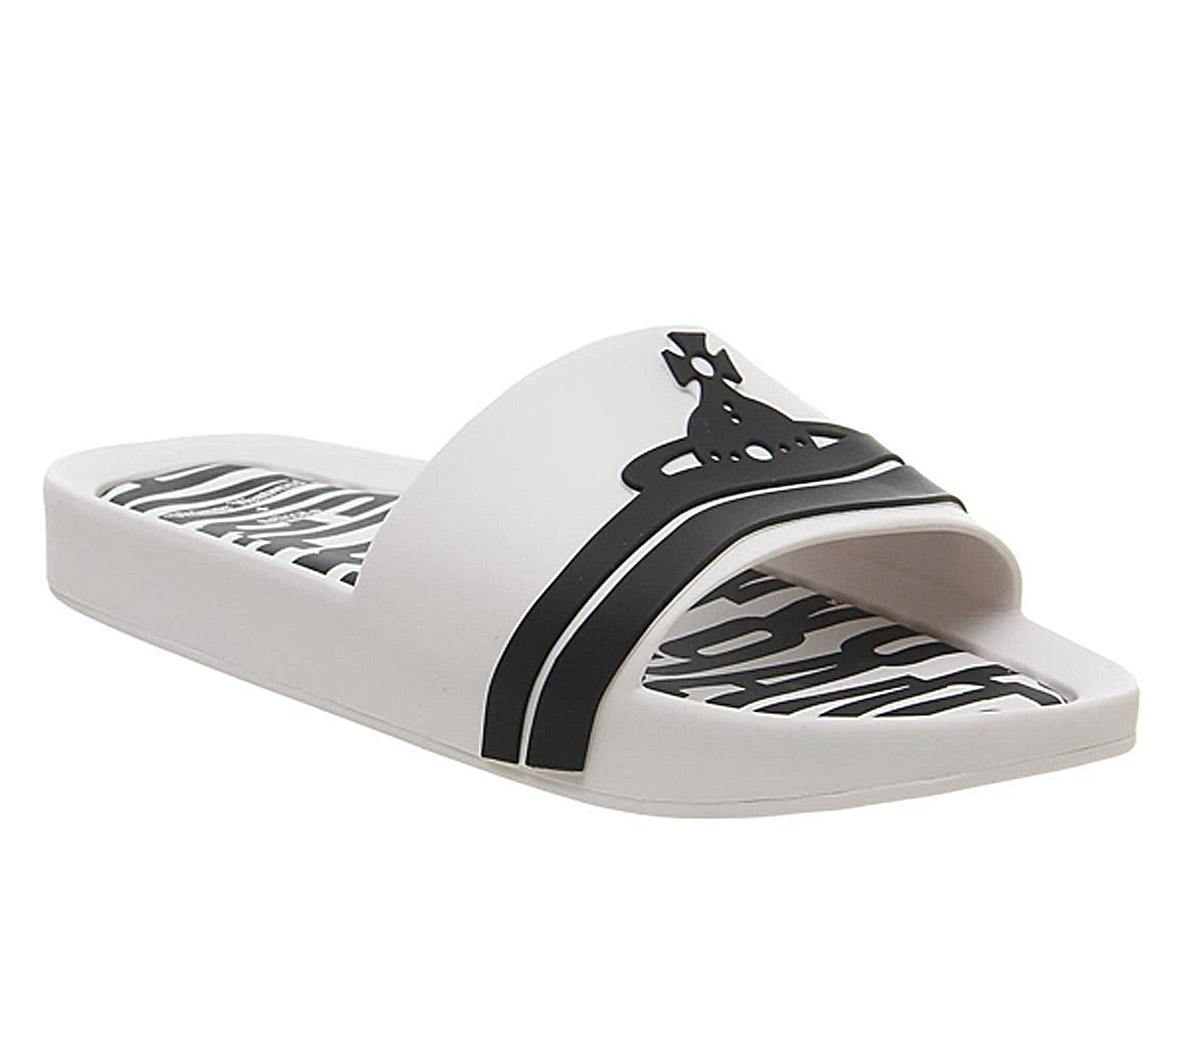 Vw Beach Slides